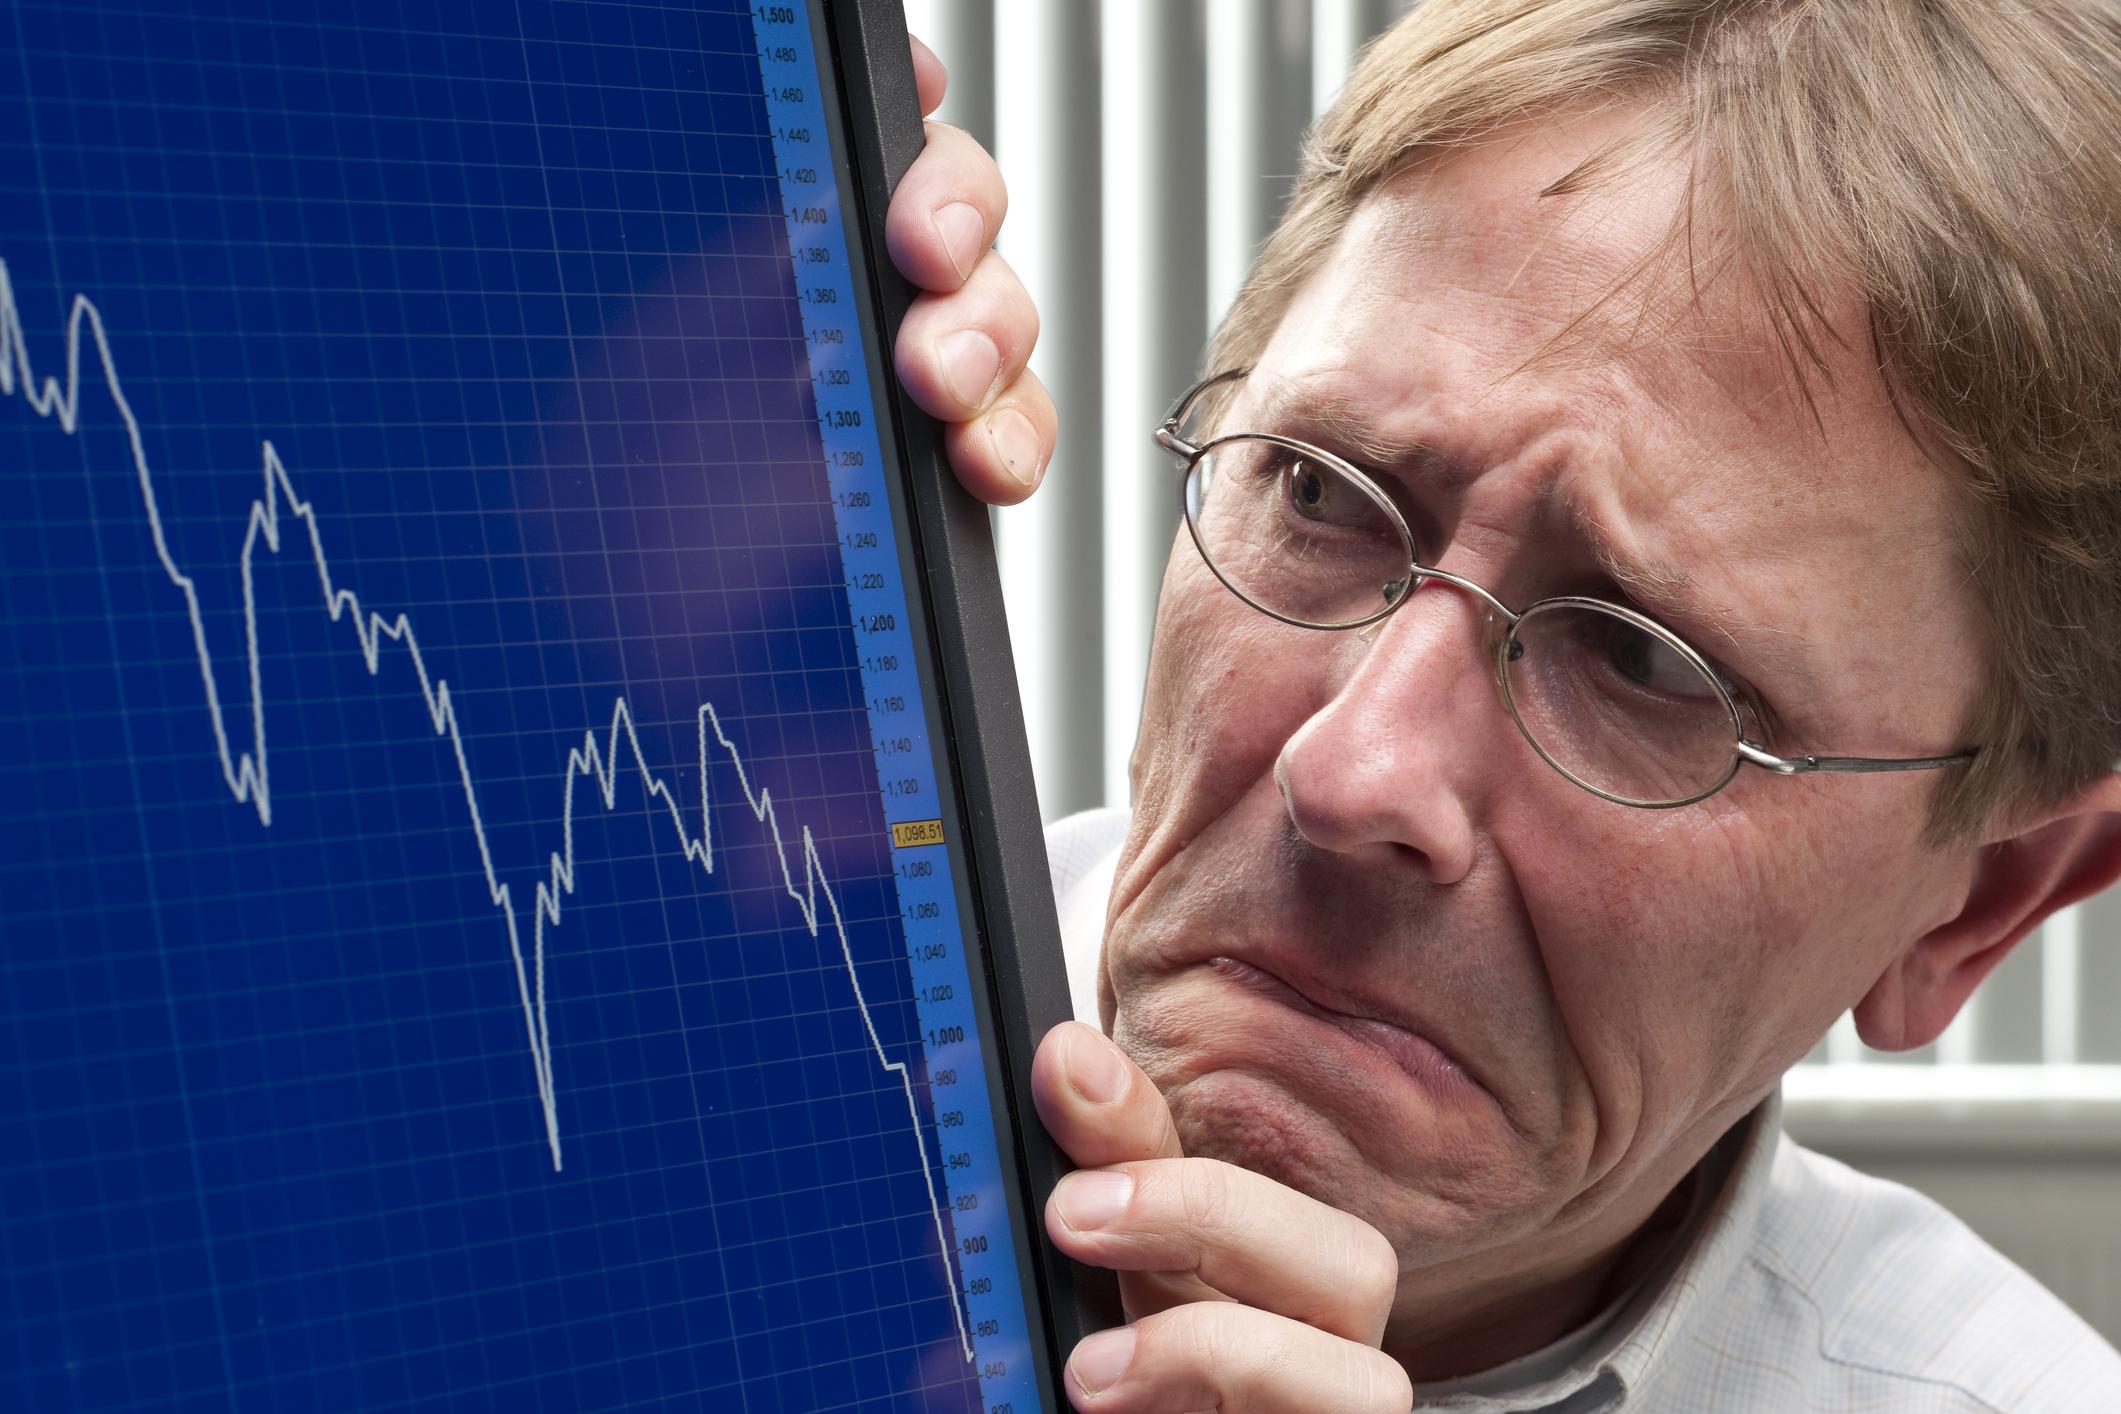 Man terrified by declining stock chart.